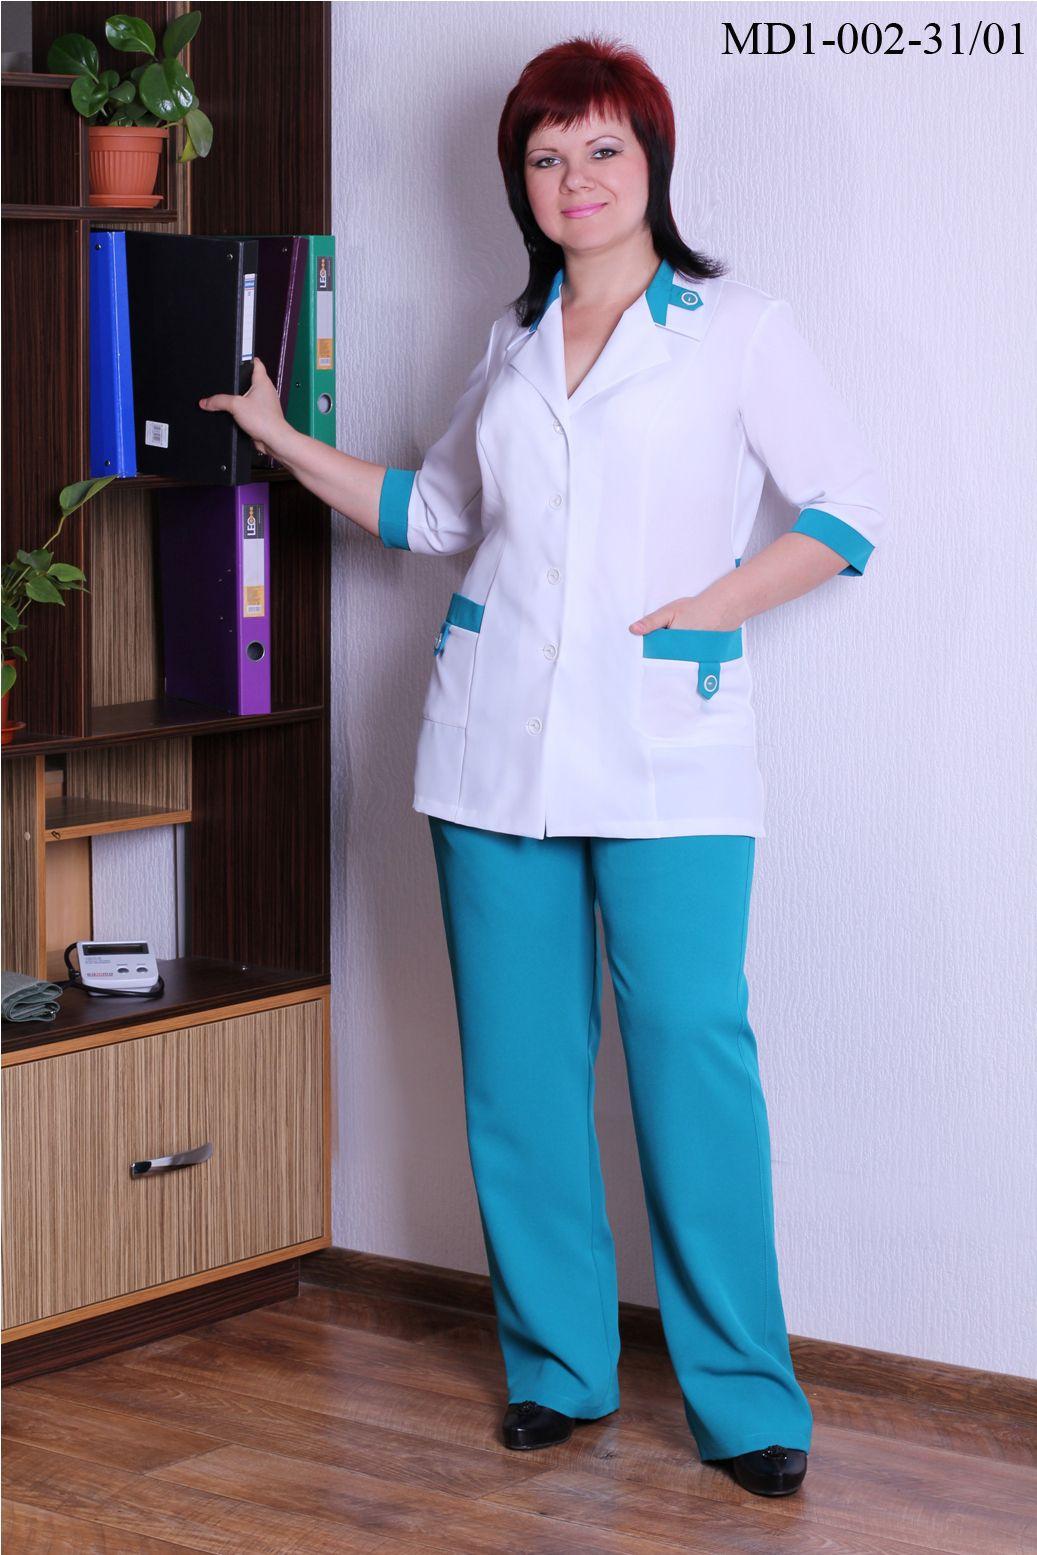 Мед. костюм MD1-002 купить на сайте производителя